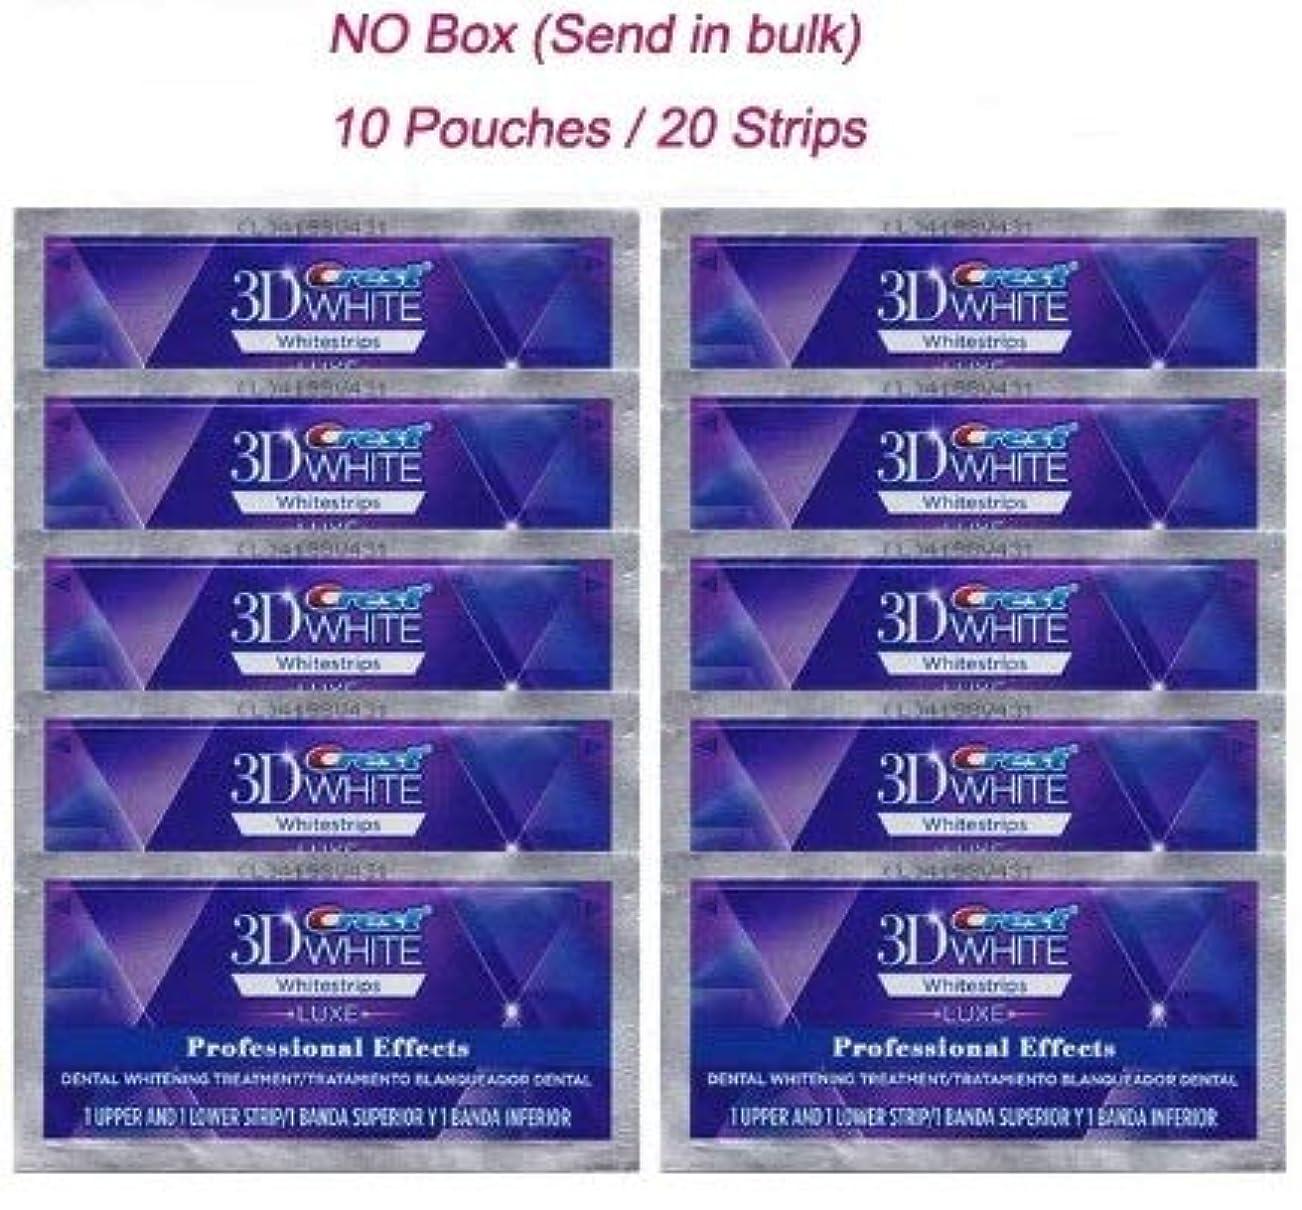 10Pack 3D Whitestrip Teeth Whitening 10回分歯 ホワイトニングテープ 10Pack (No Box)